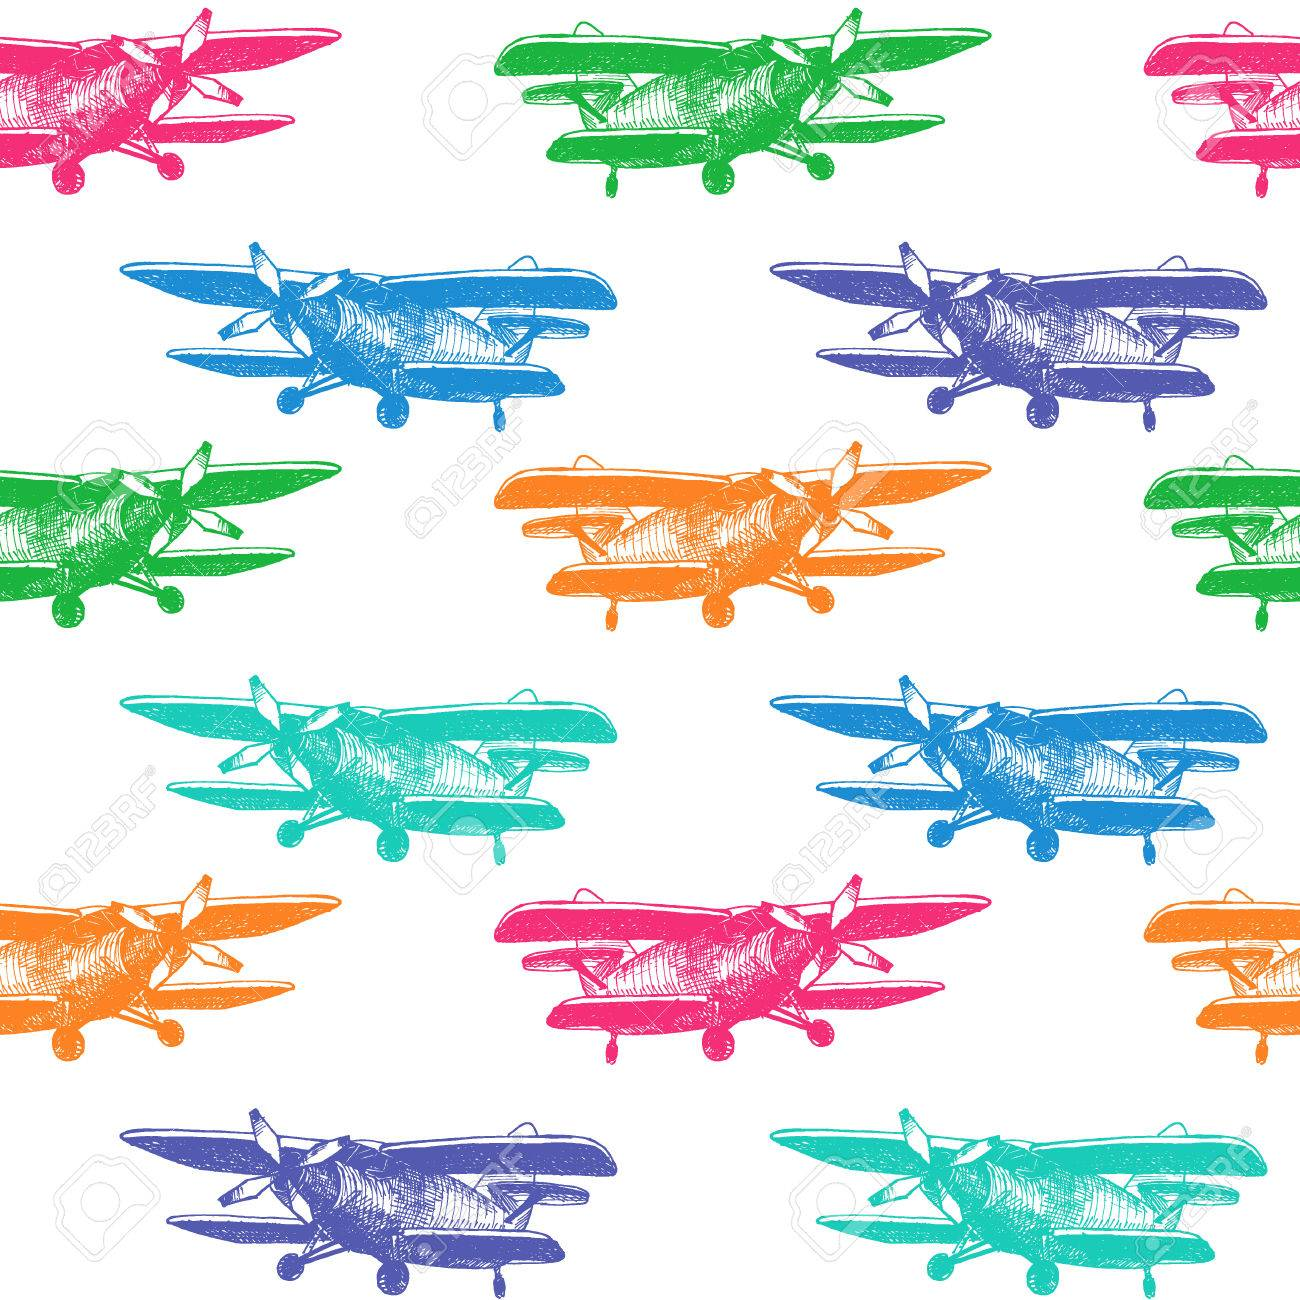 1300x1300 Vector Illustration Of Small Plane Sketch For Design, Website